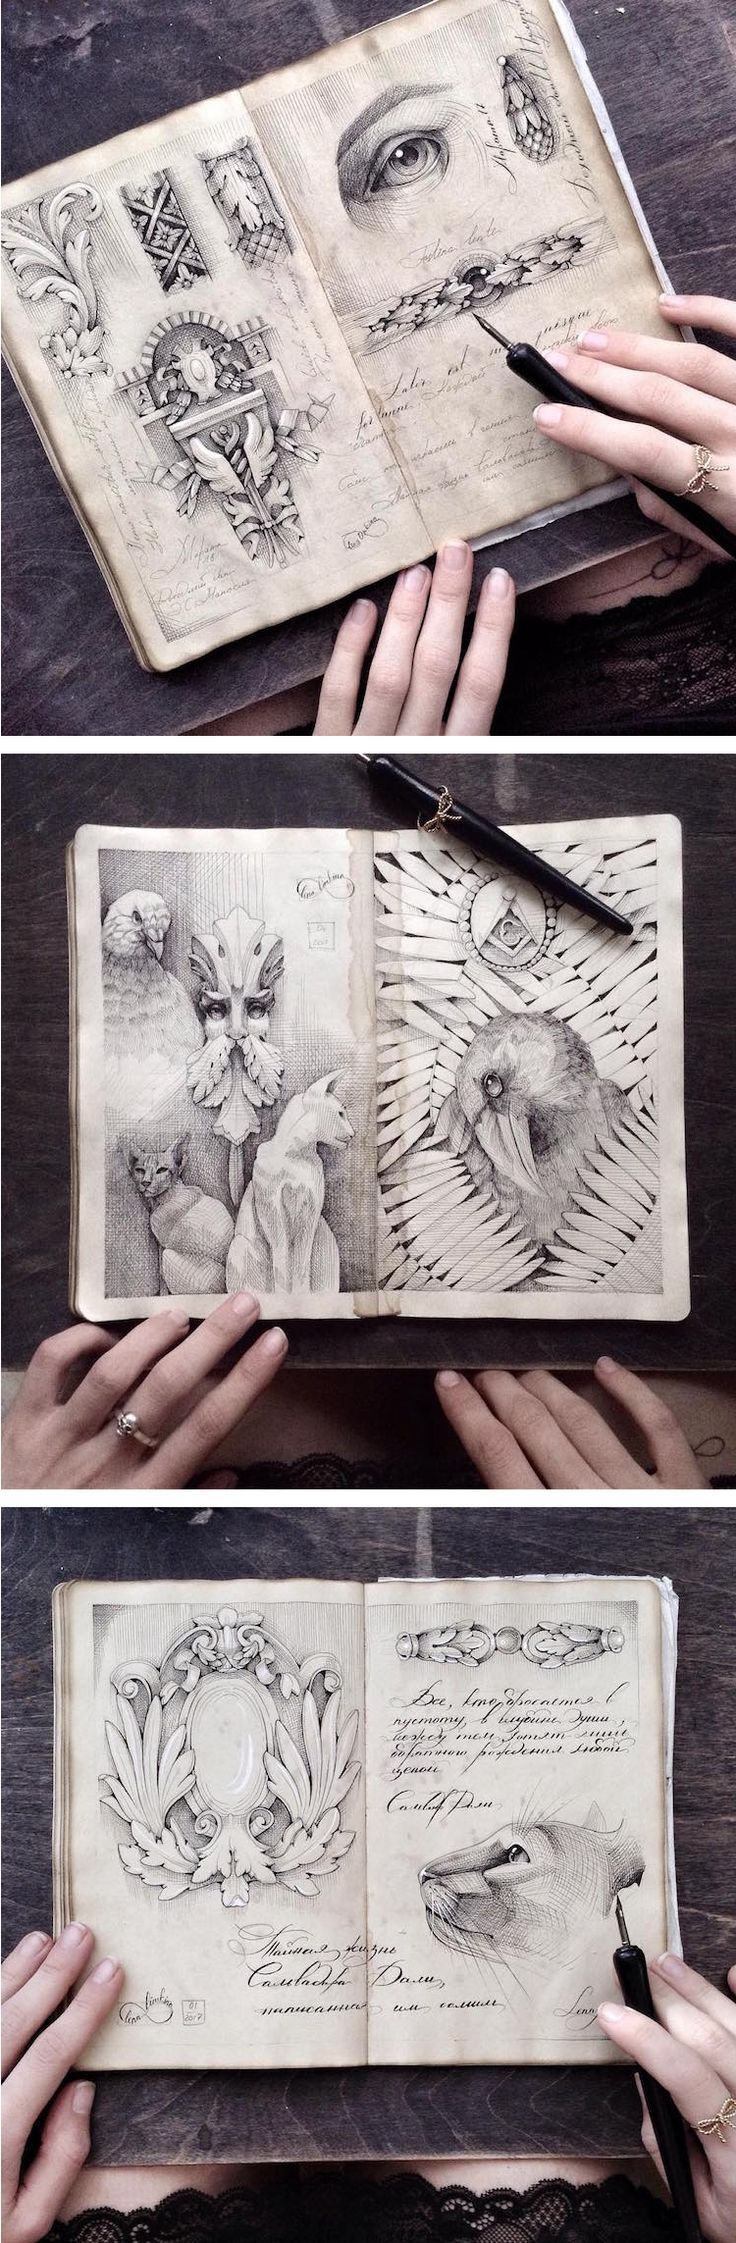 Sketchbook art by Elena Limkina // art journals